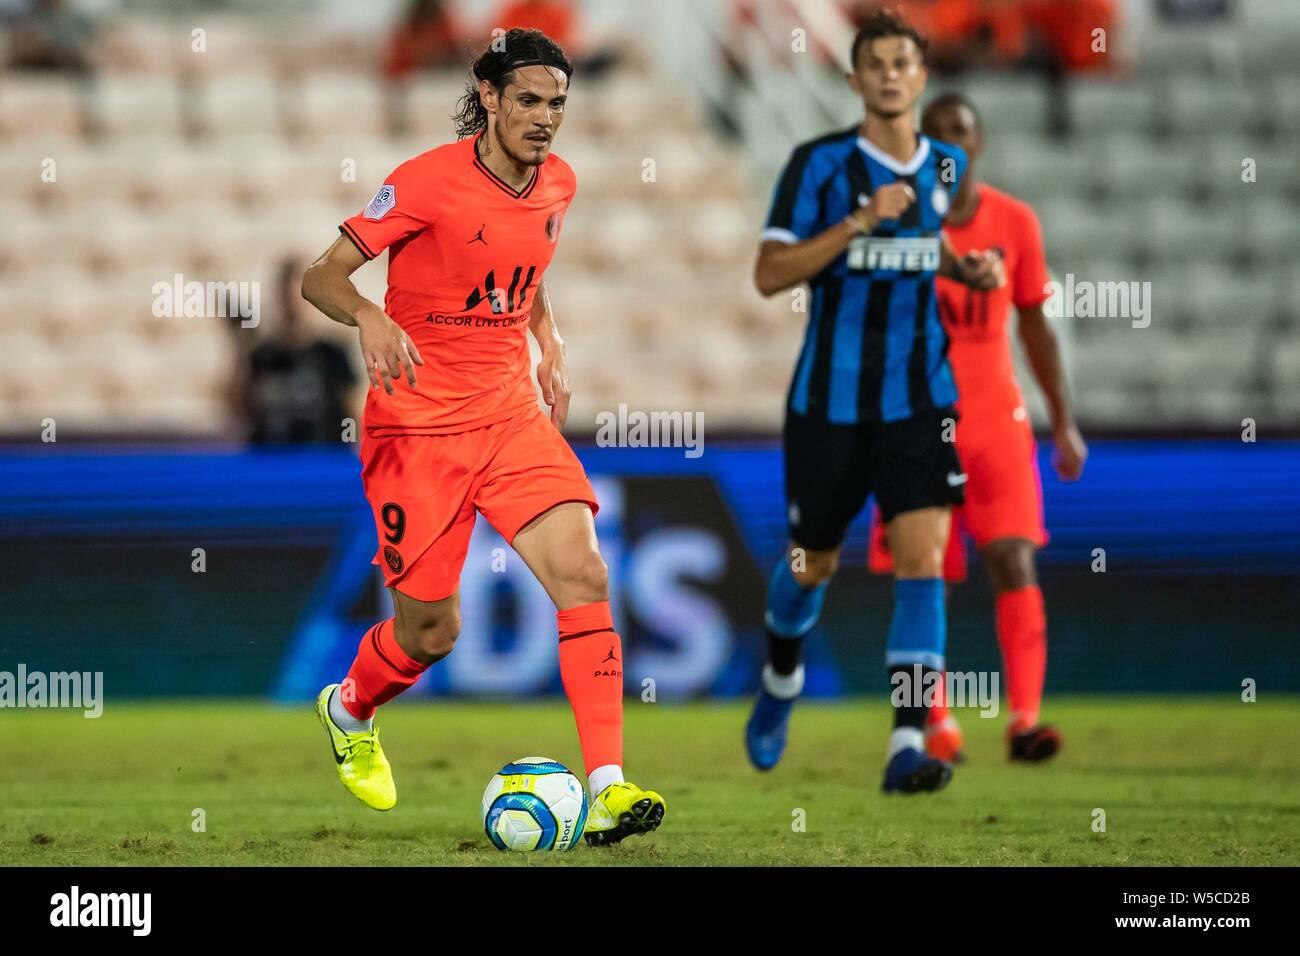 Uruguayan Football Player High Resolution Stock Photography and ...